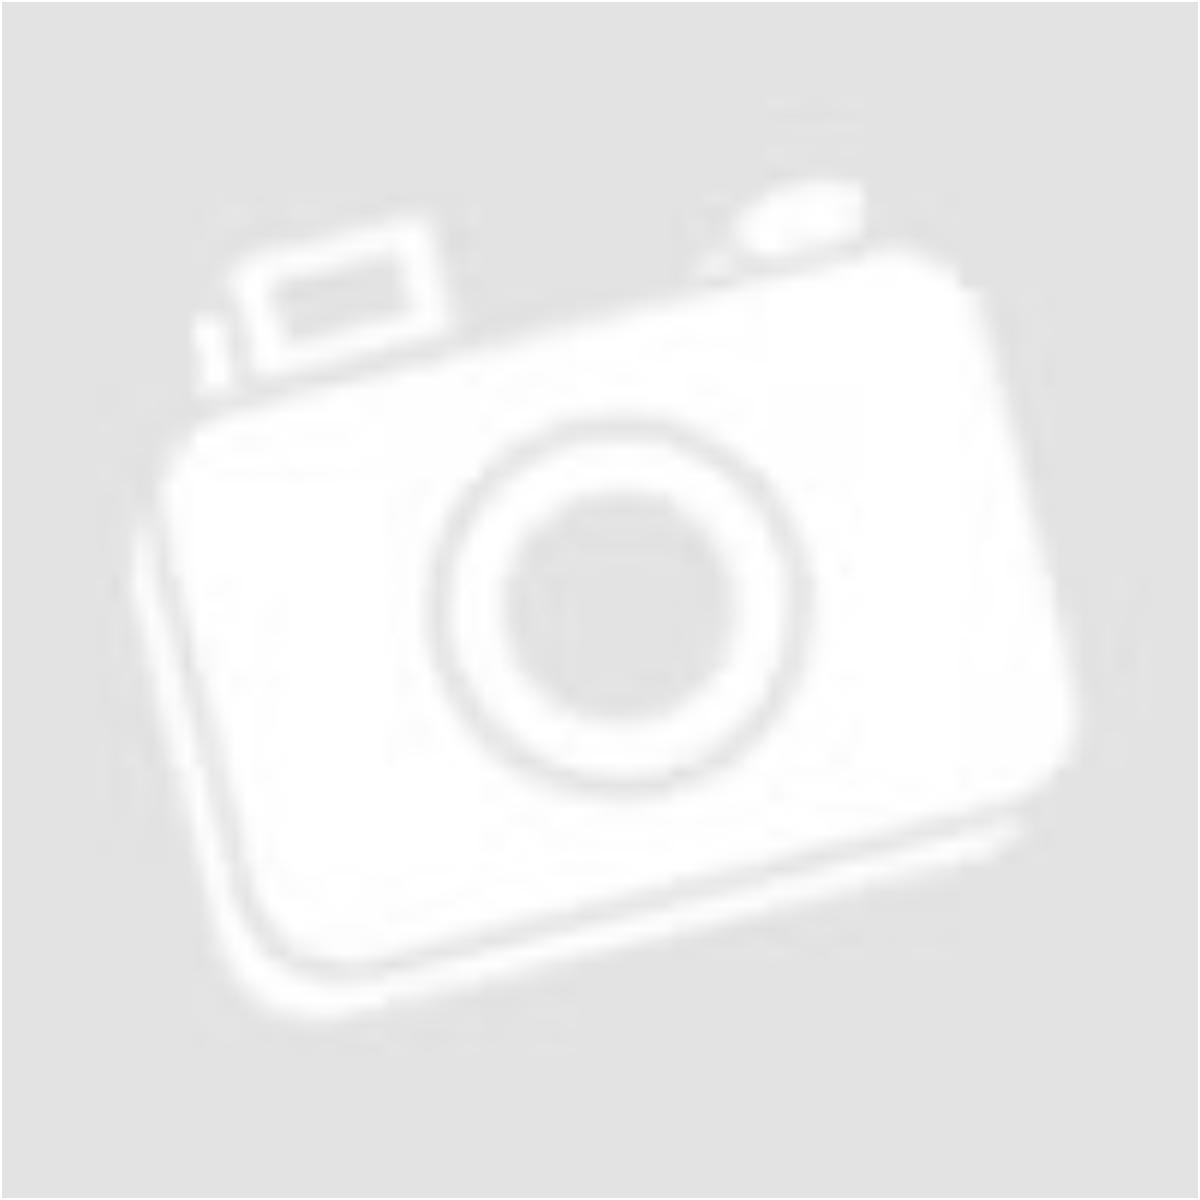 BIANCHI ARIA - ULTEGRA 11SP 52/36 (VISION TEAM) kerékpár